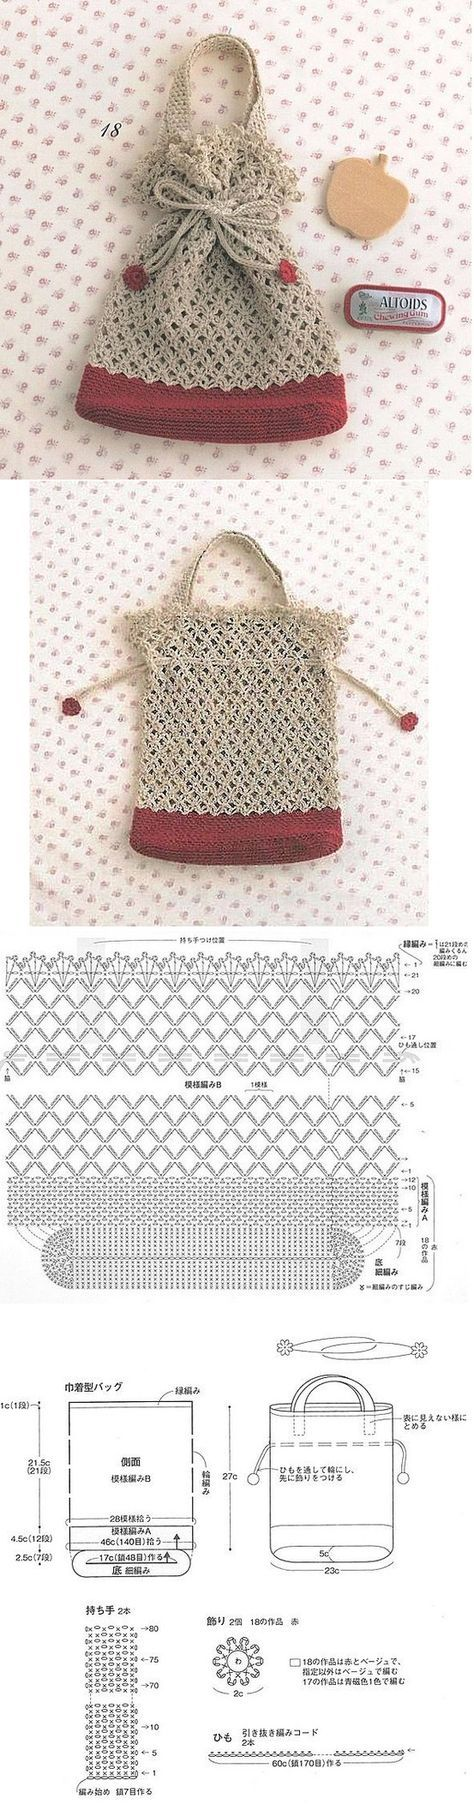 Sweet Crochet Pouch - Chart <3